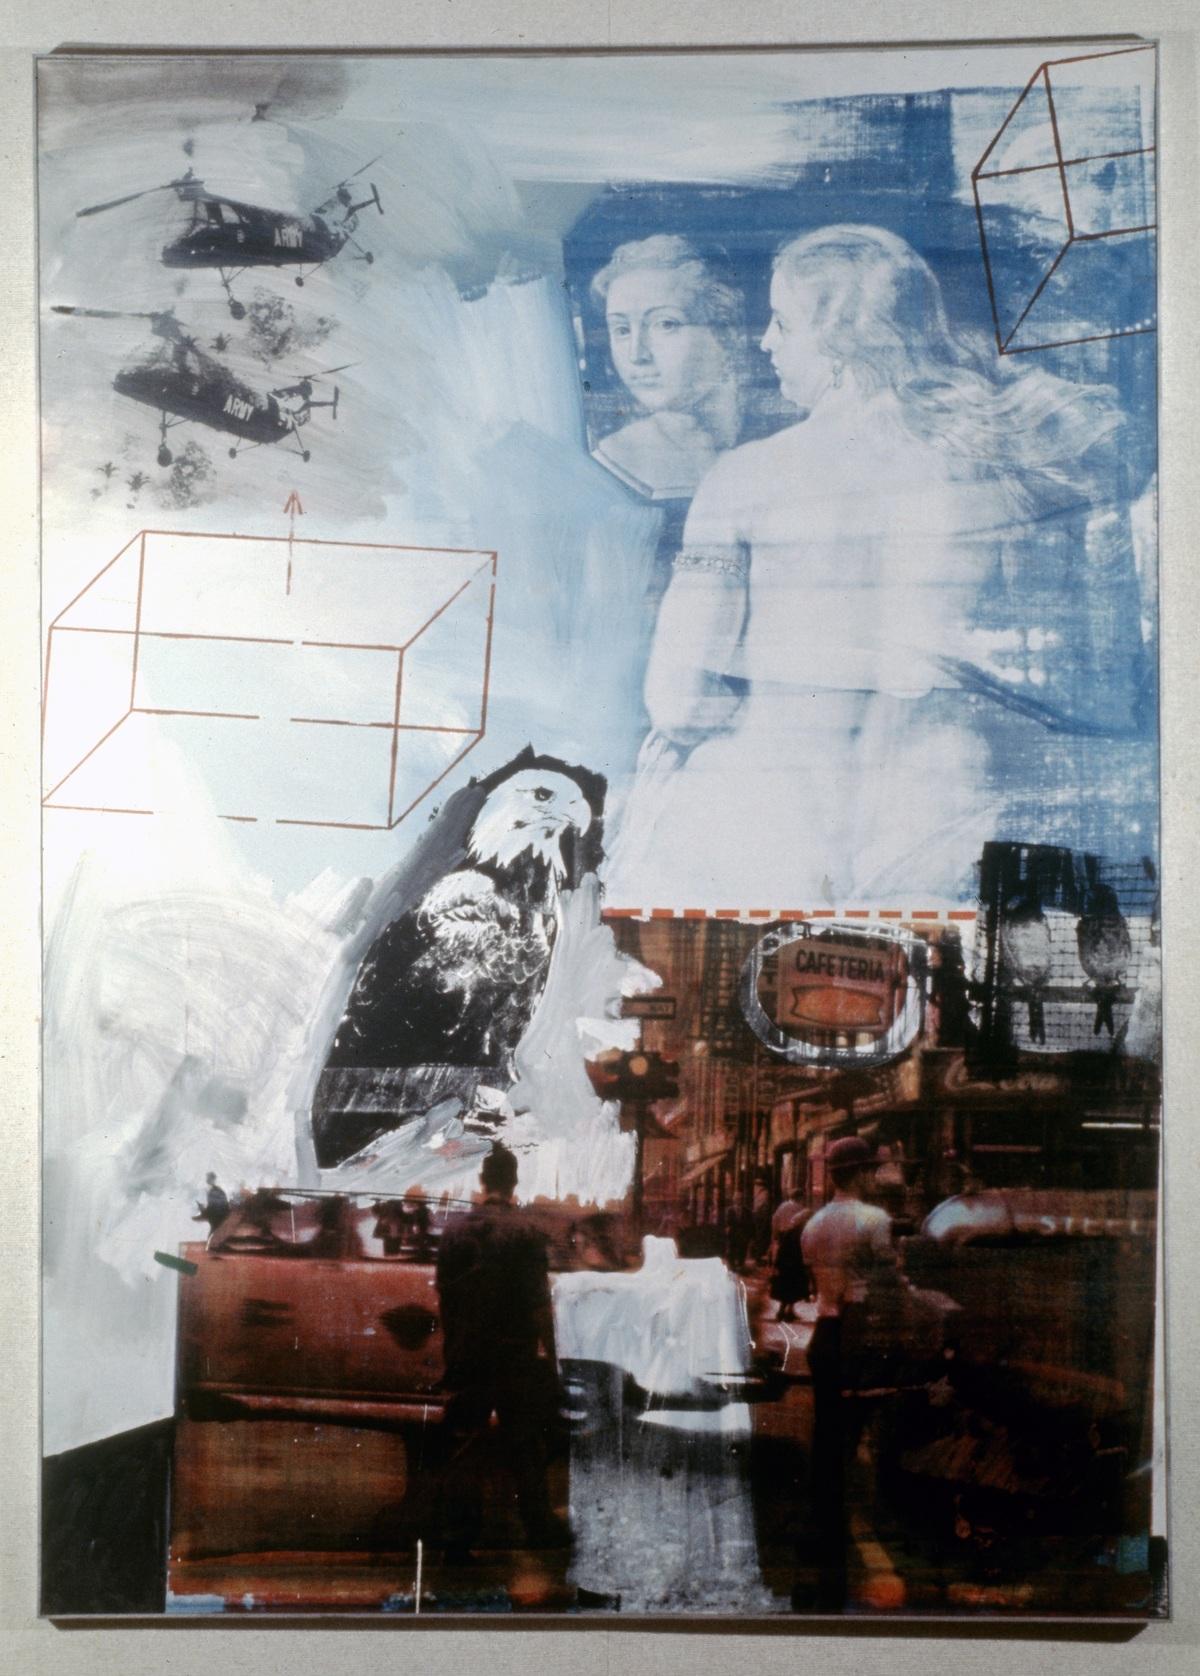 Figure 1. Tracer by Robert Rauschenberg. Oil and silkscreen ink on canvas, 84 1/8 x 60 inches, The Nelson-Atkins Museum of Art, Kansas City, Missouri. Artwork © Robert Rauschenberg Foundation, New York. Image via Fresh Meat.